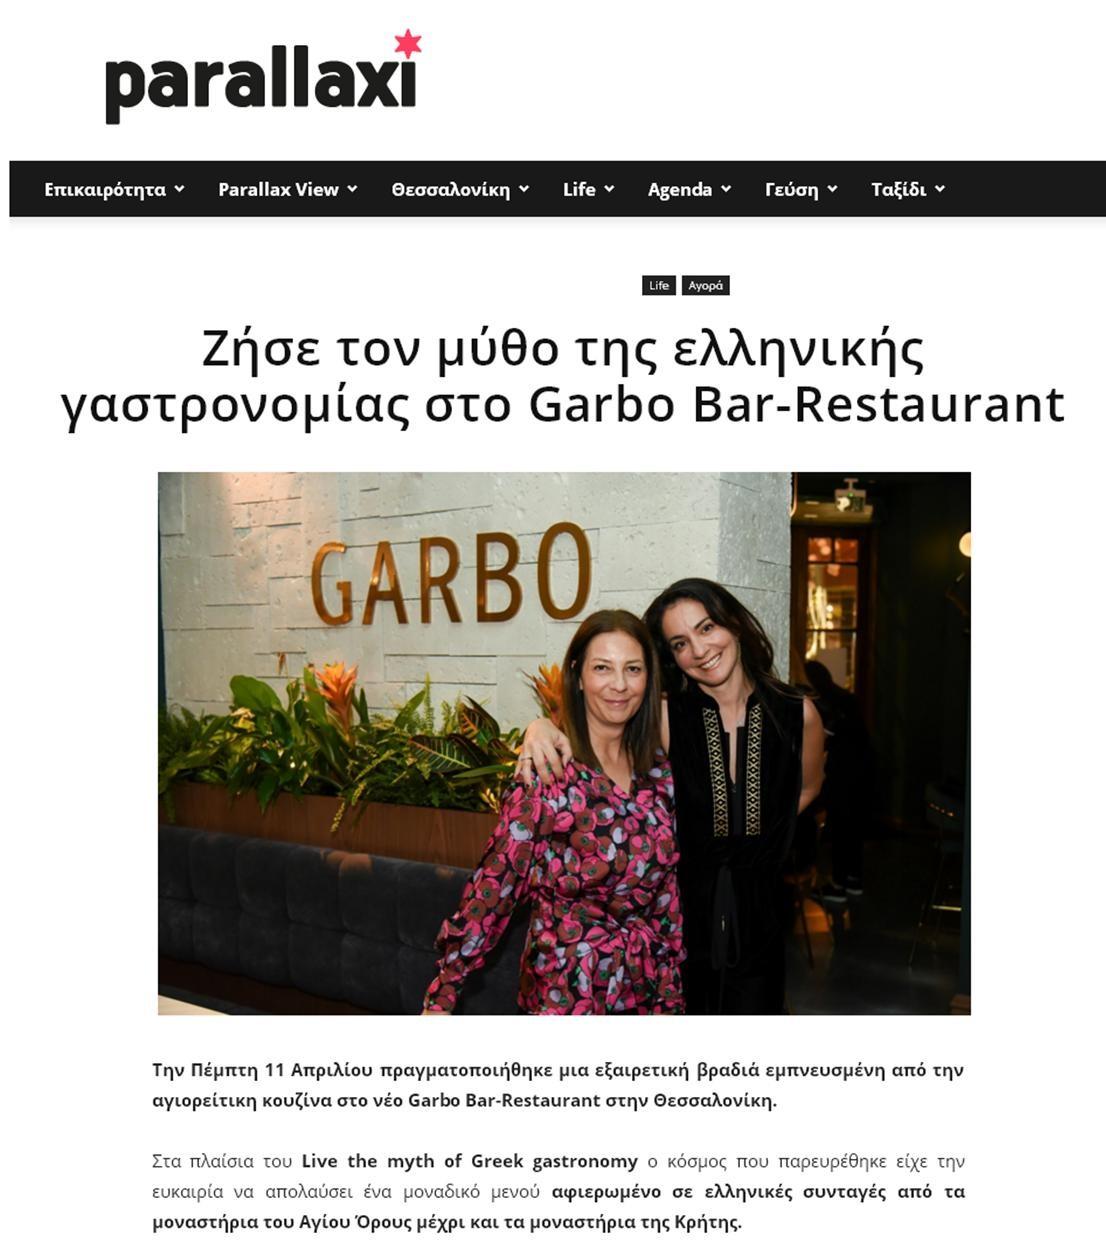 Garbo Bar-Restaurant, Αγιορείτικη βραδιά